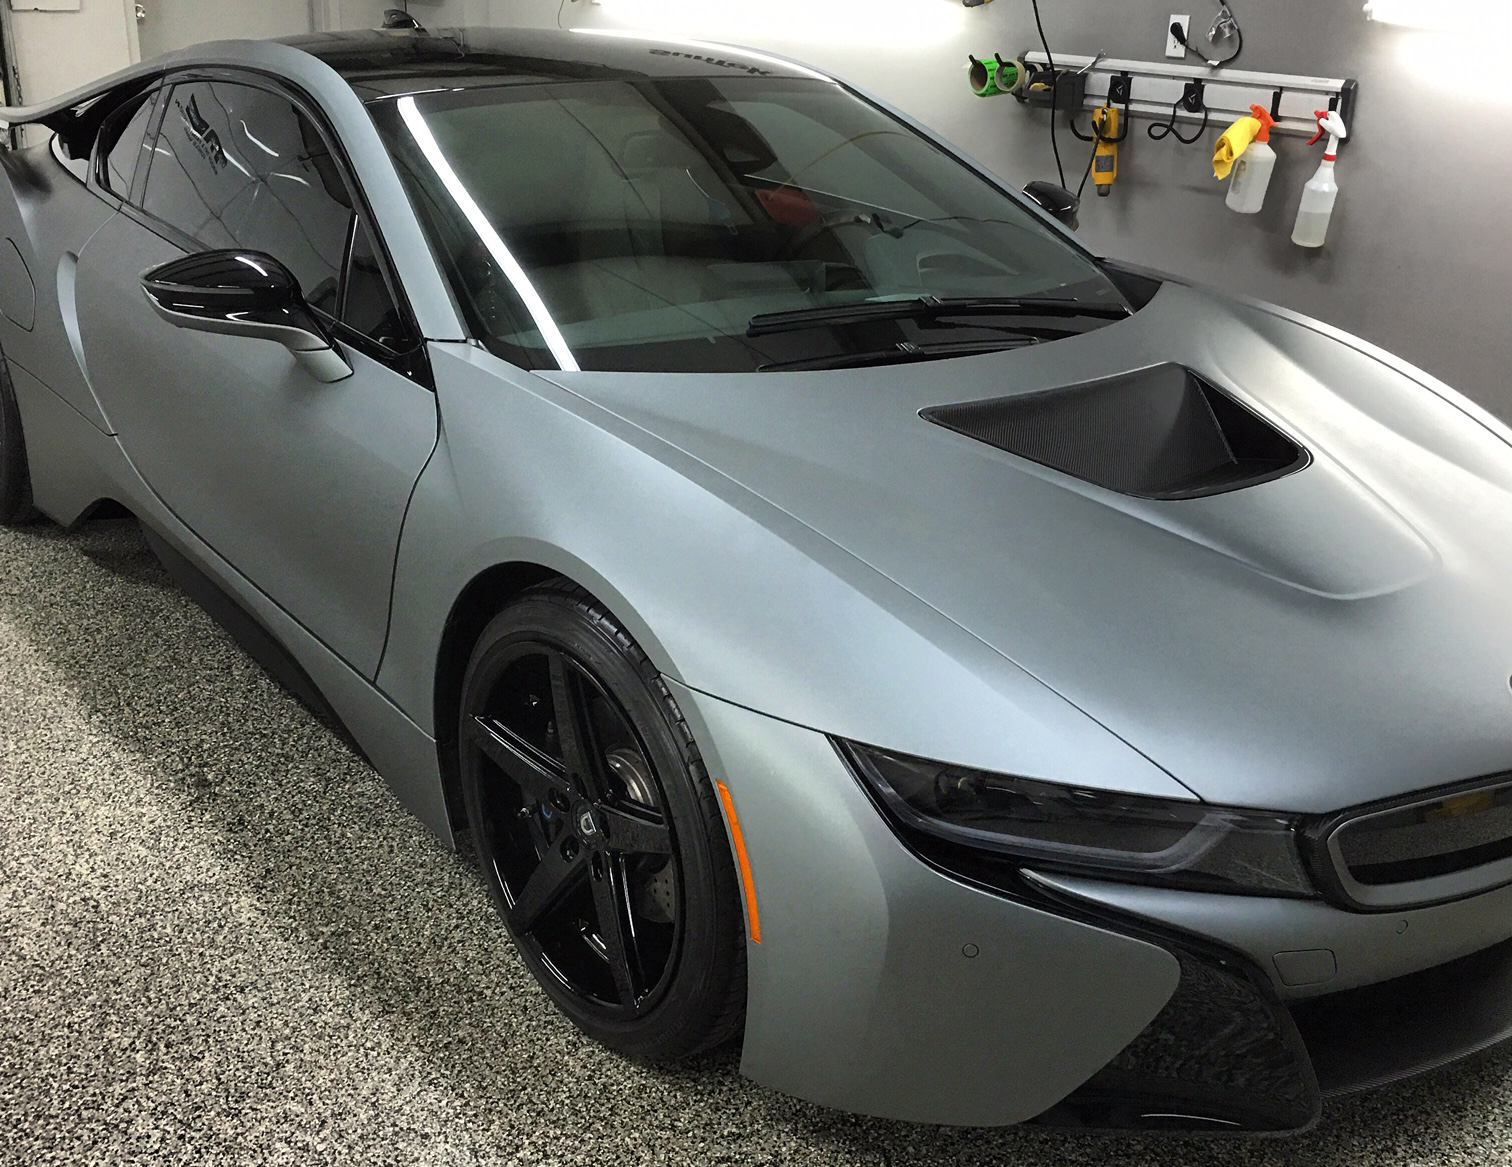 BMW+i8+matte+metallic+grey+wrap+nashville+thewraplab.JPG